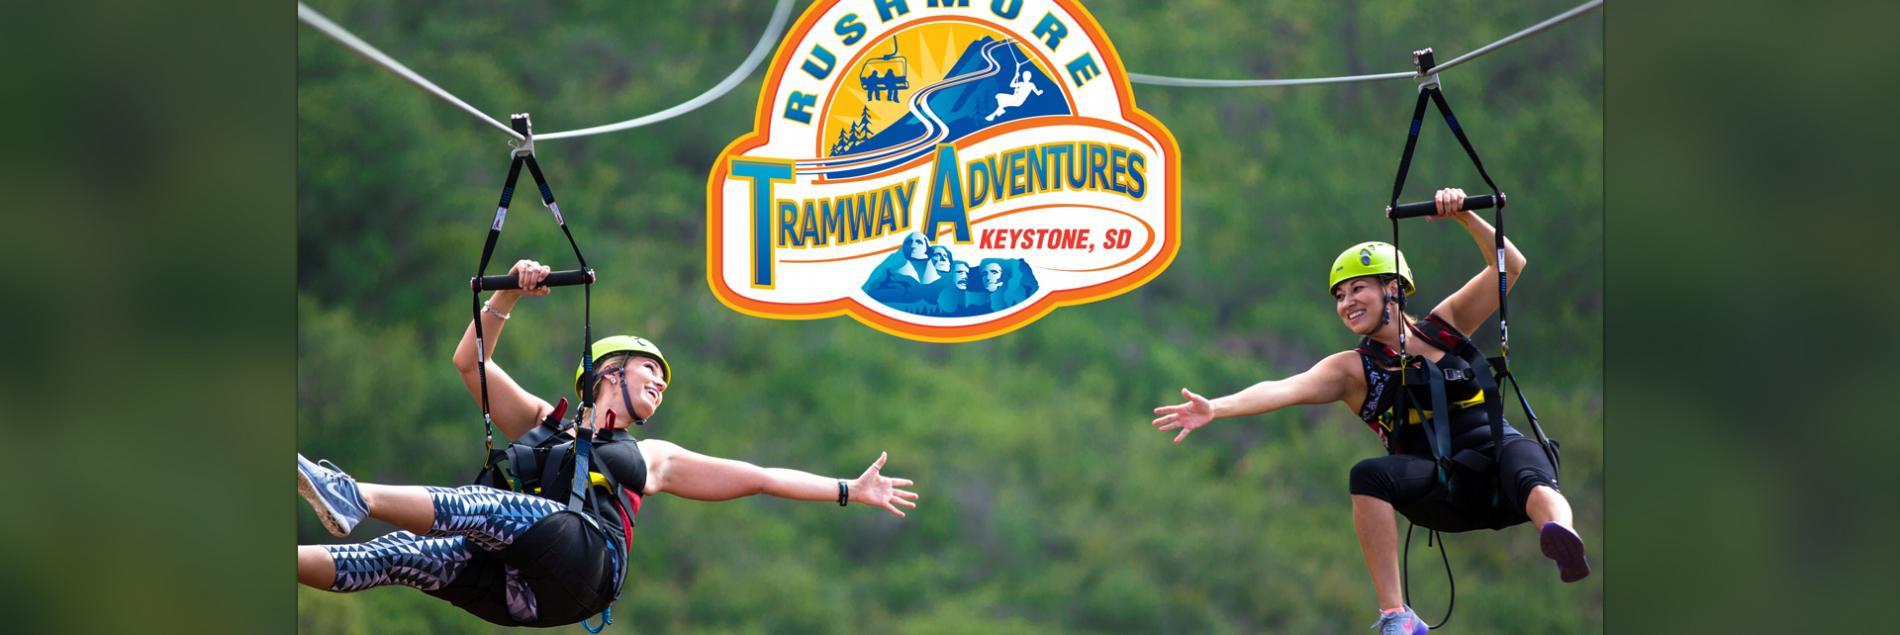 Aerial Adventure Park at Rushmore Tramway Adventures*